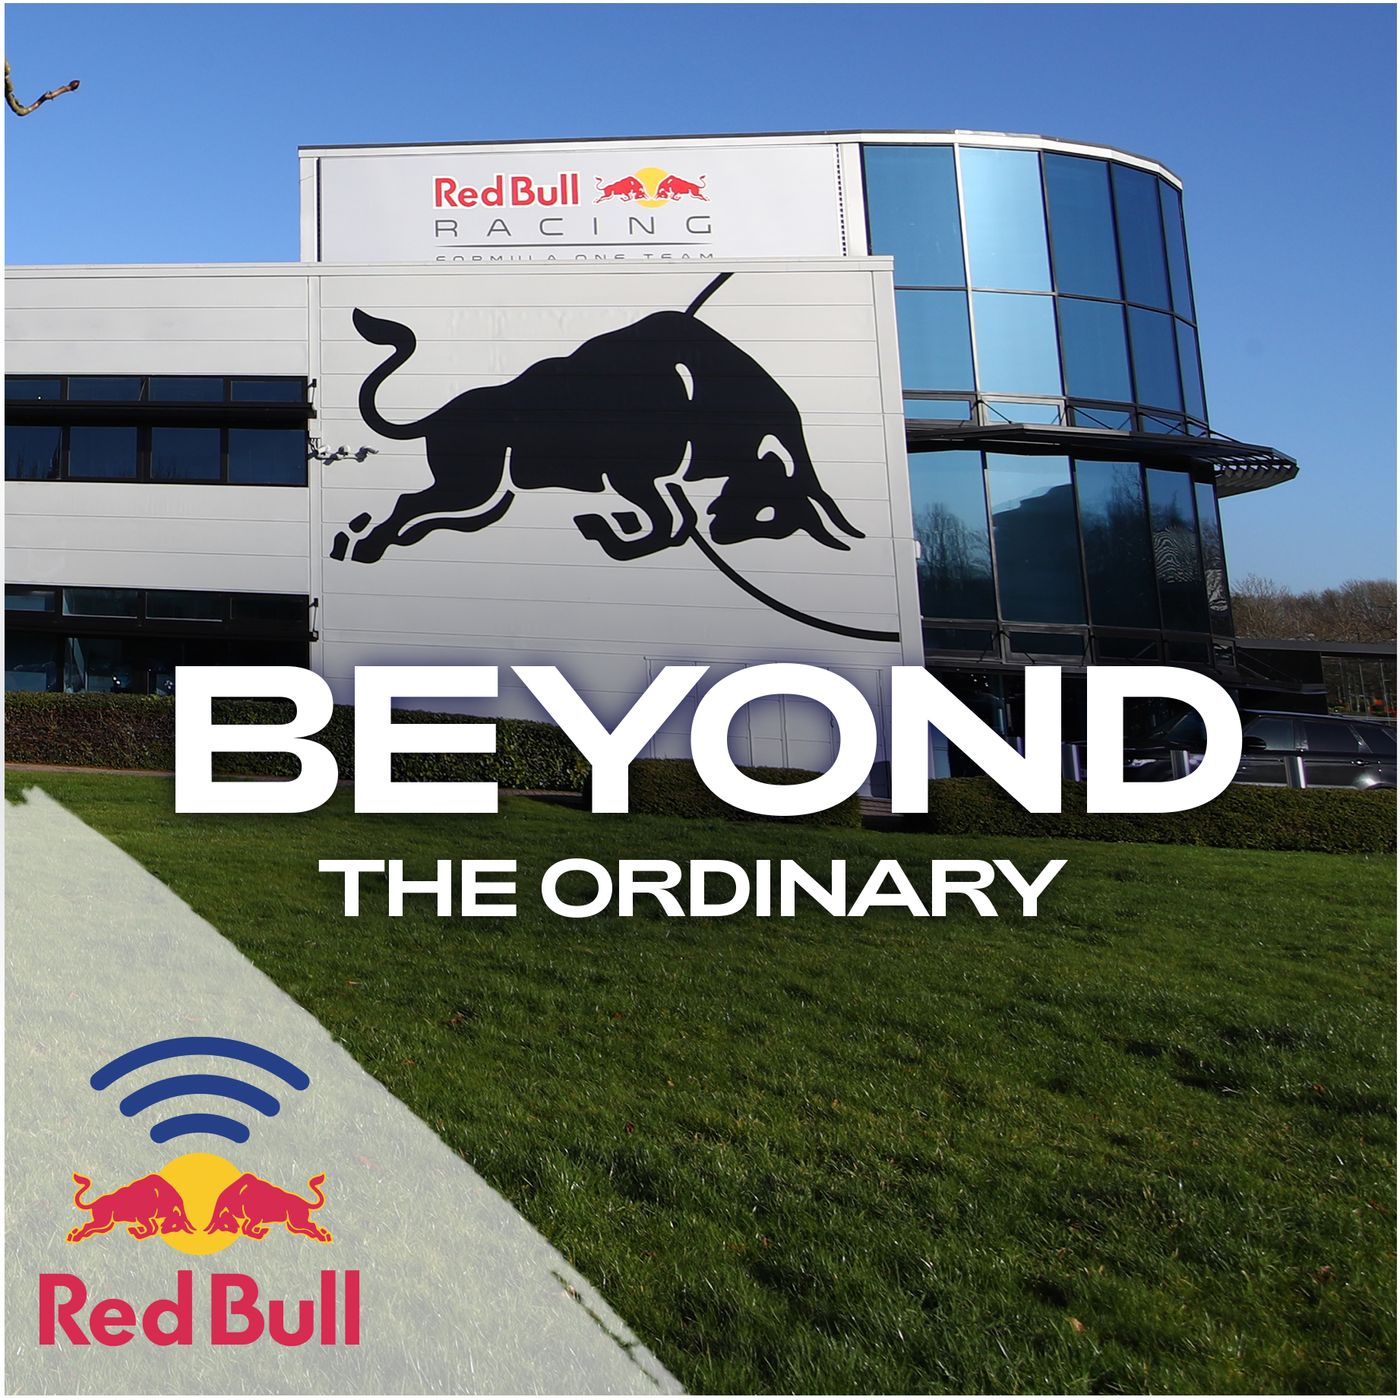 TOP SECRET - go inside F1 Red Bull Racing's Operations Room